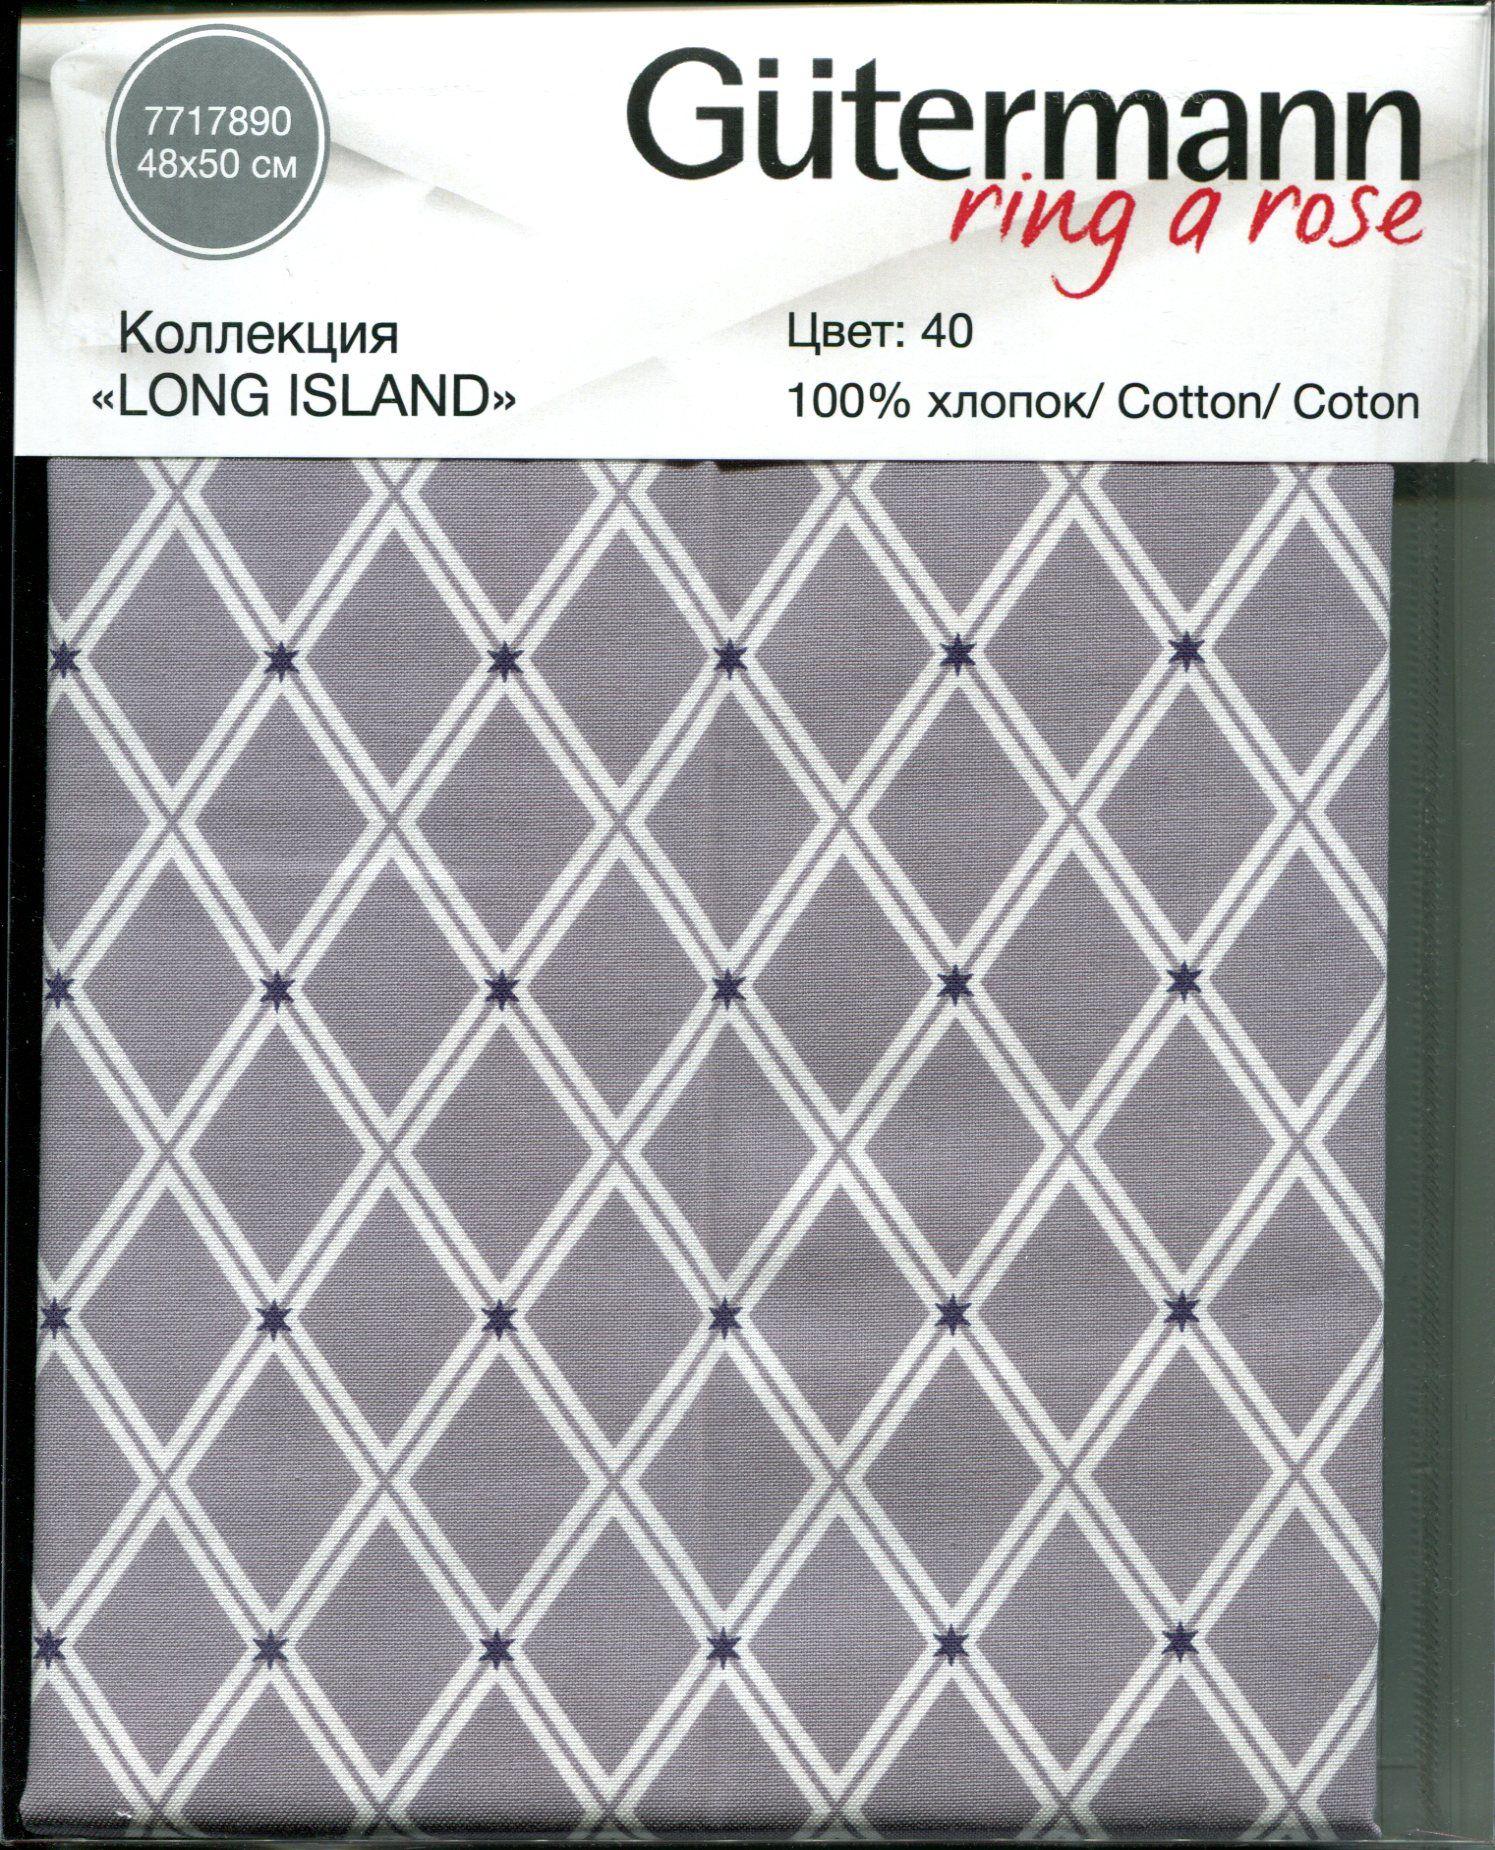 647489 Ткань коллекция 'Long Island', 48х50см, 100% хлопок Гутерманн